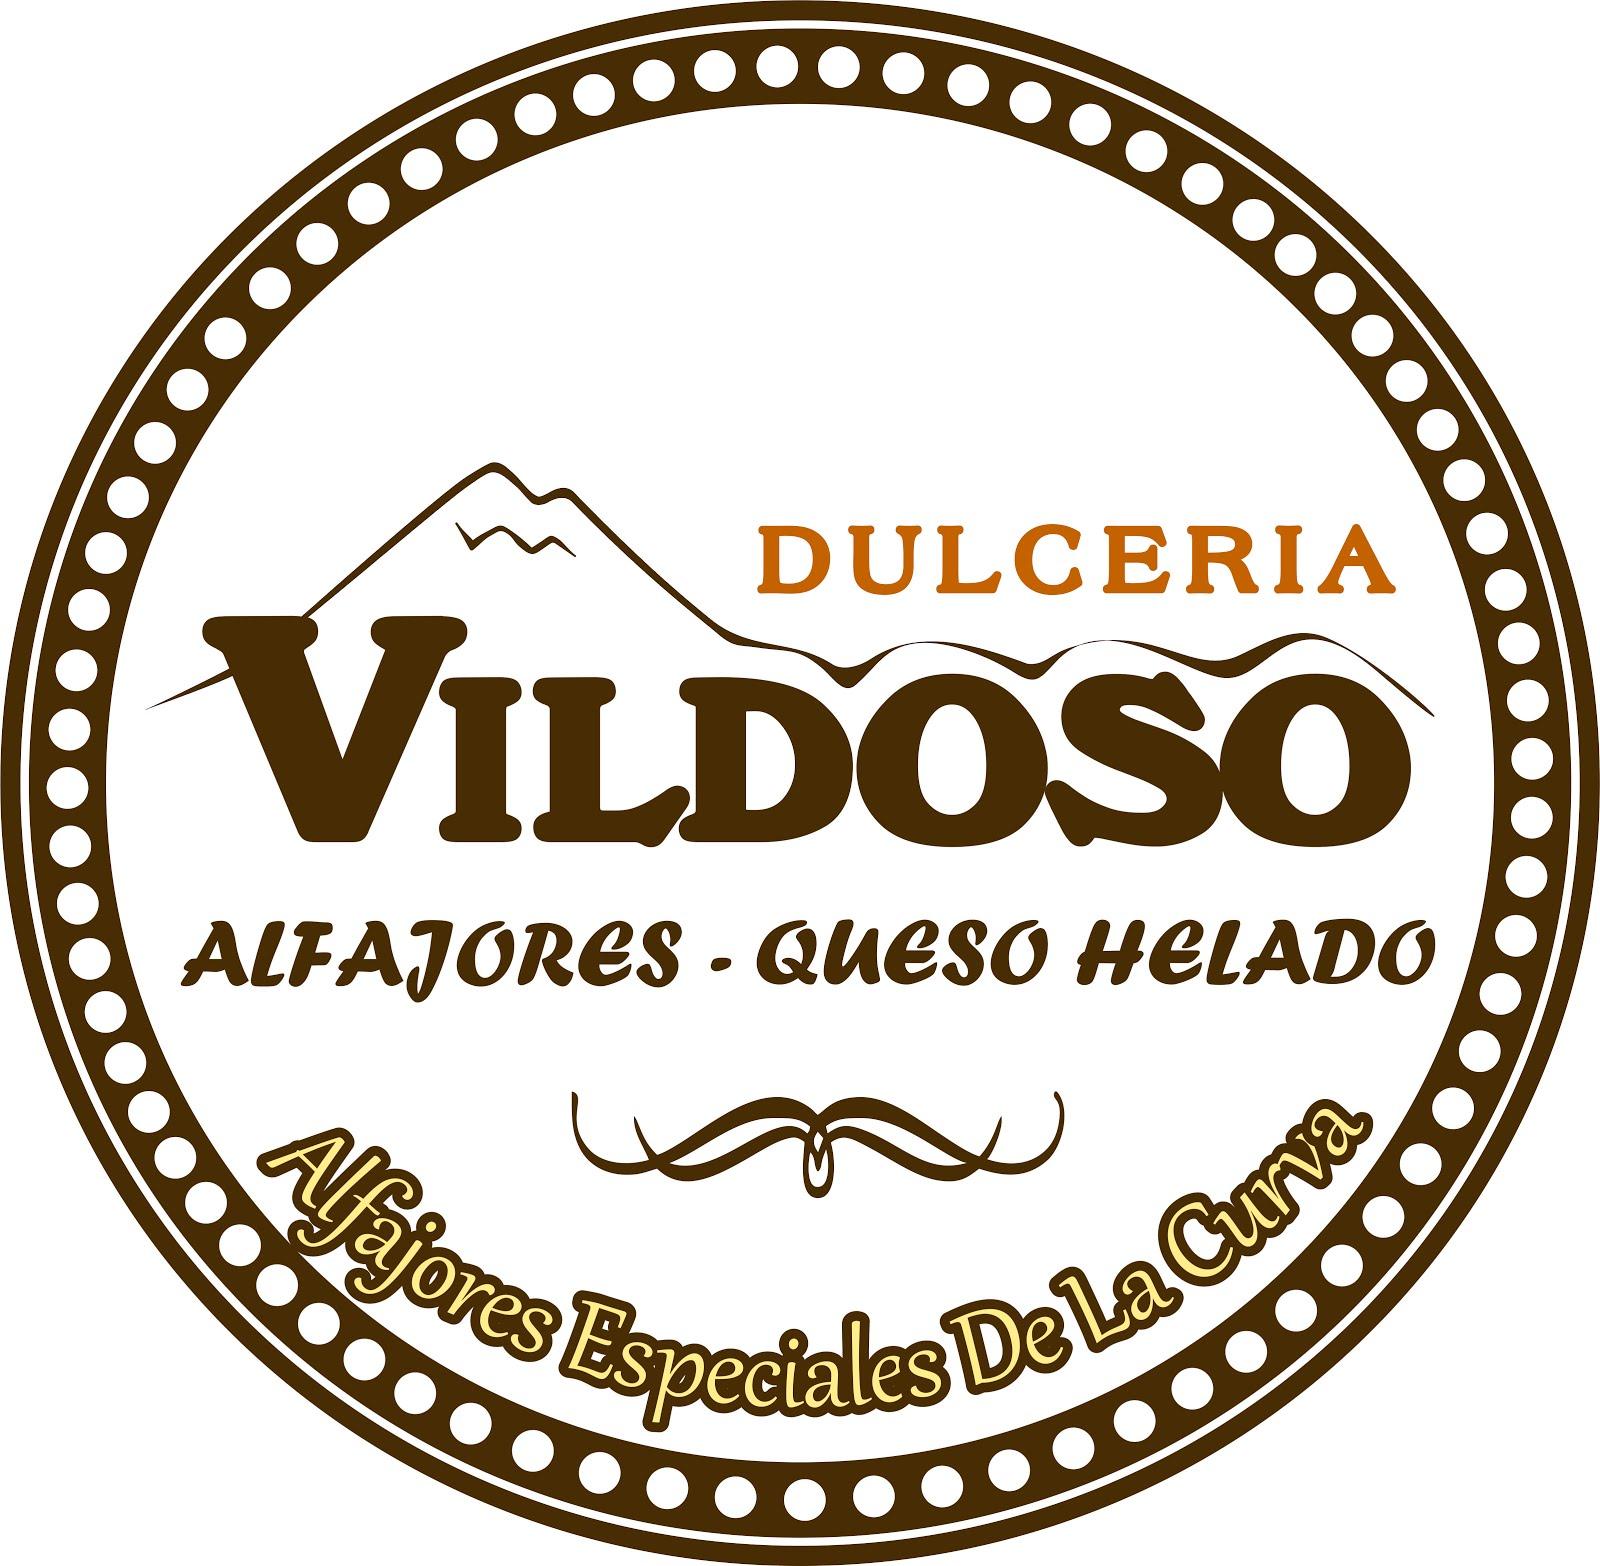 DULCERIA VILDOSO